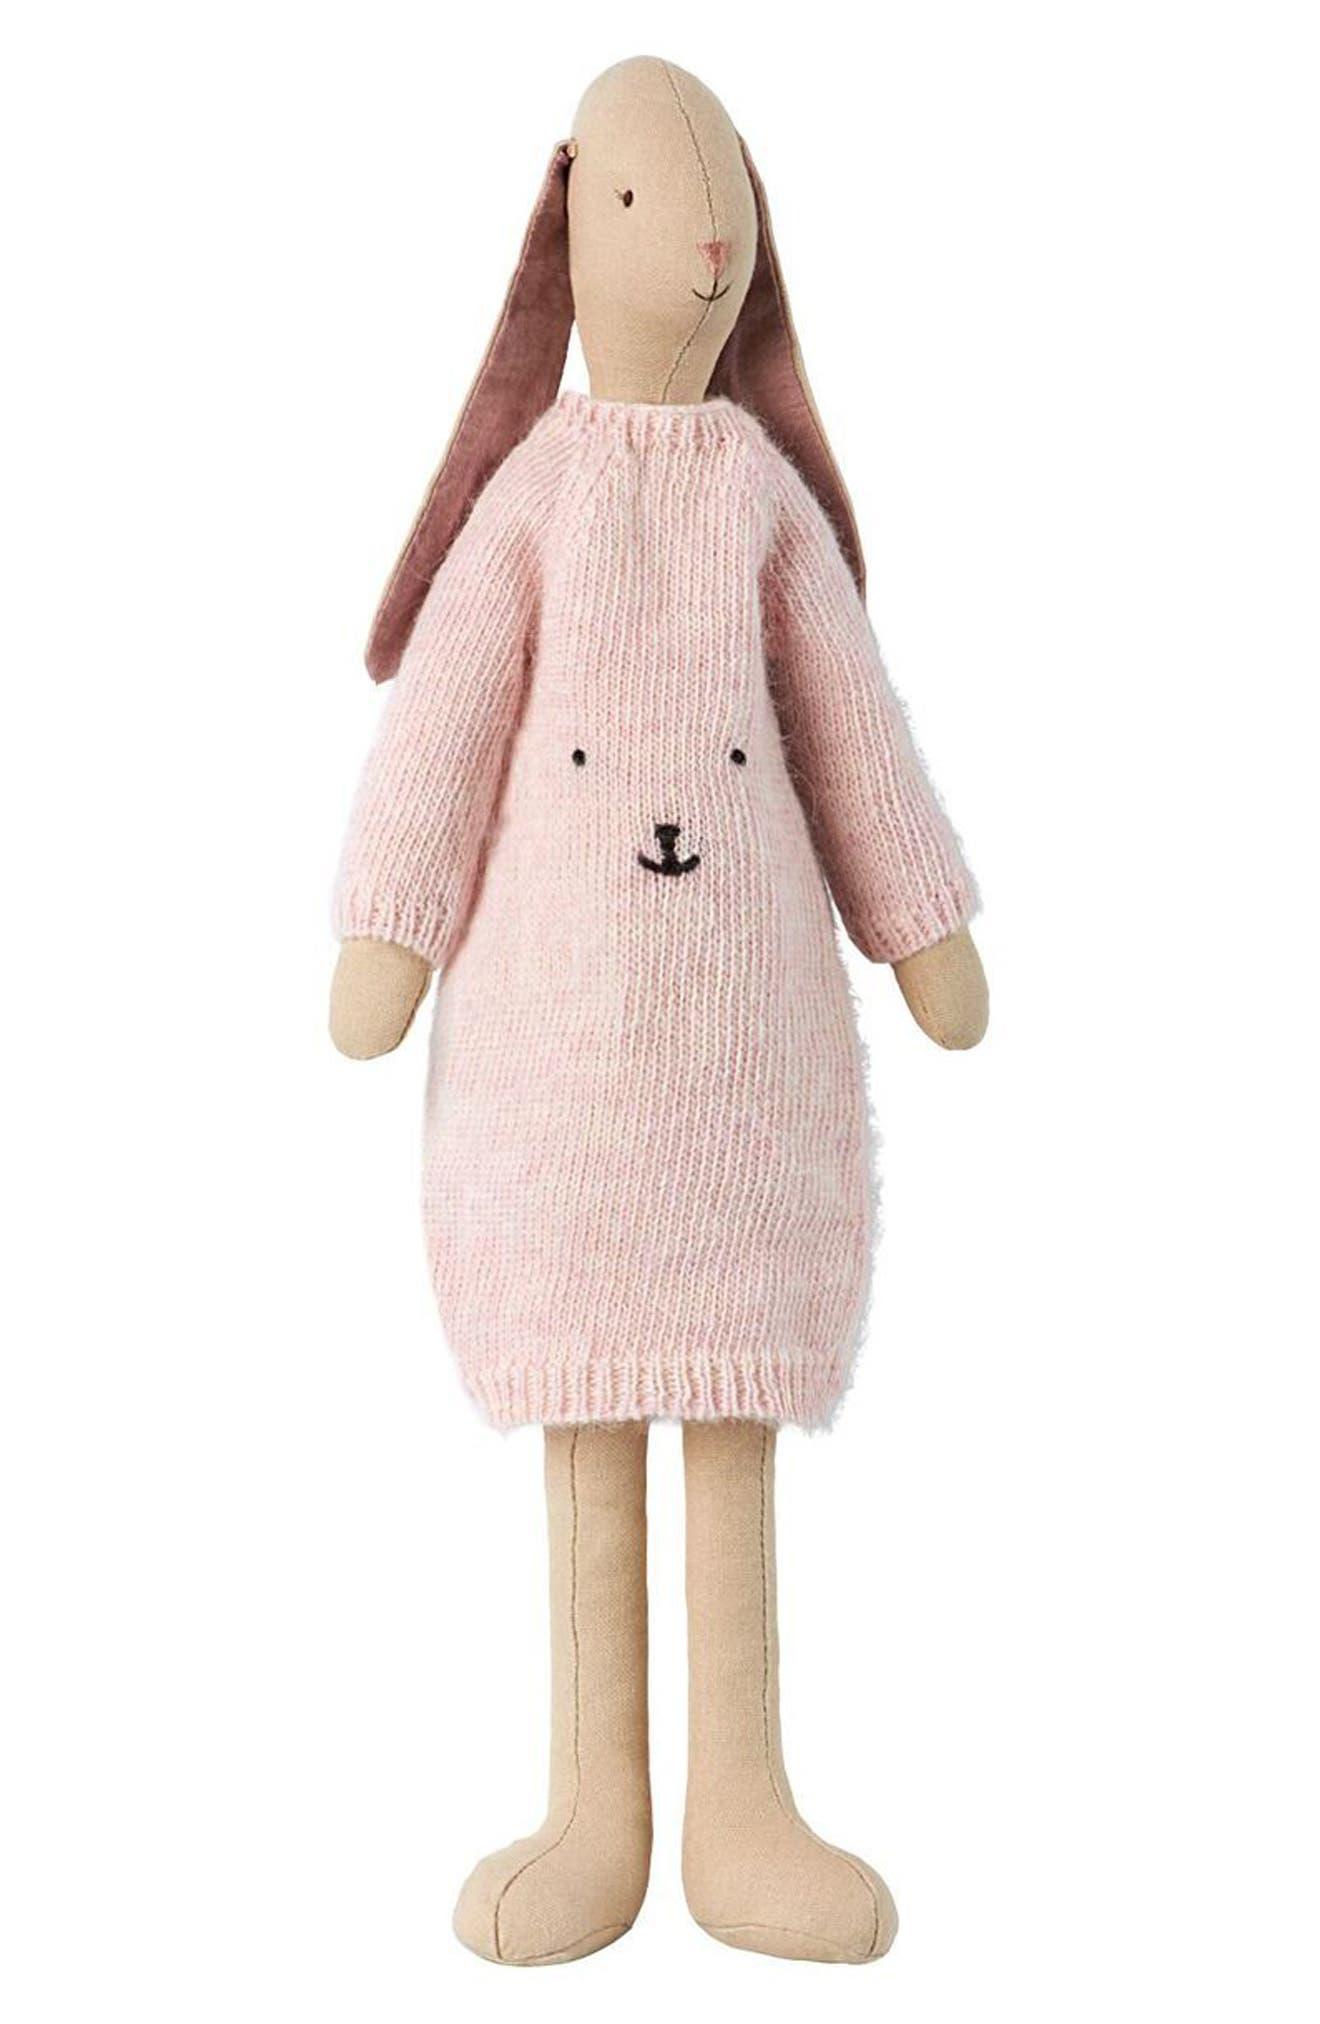 Sweater Bunny Stuffed Animal,                         Main,                         color, MULTI